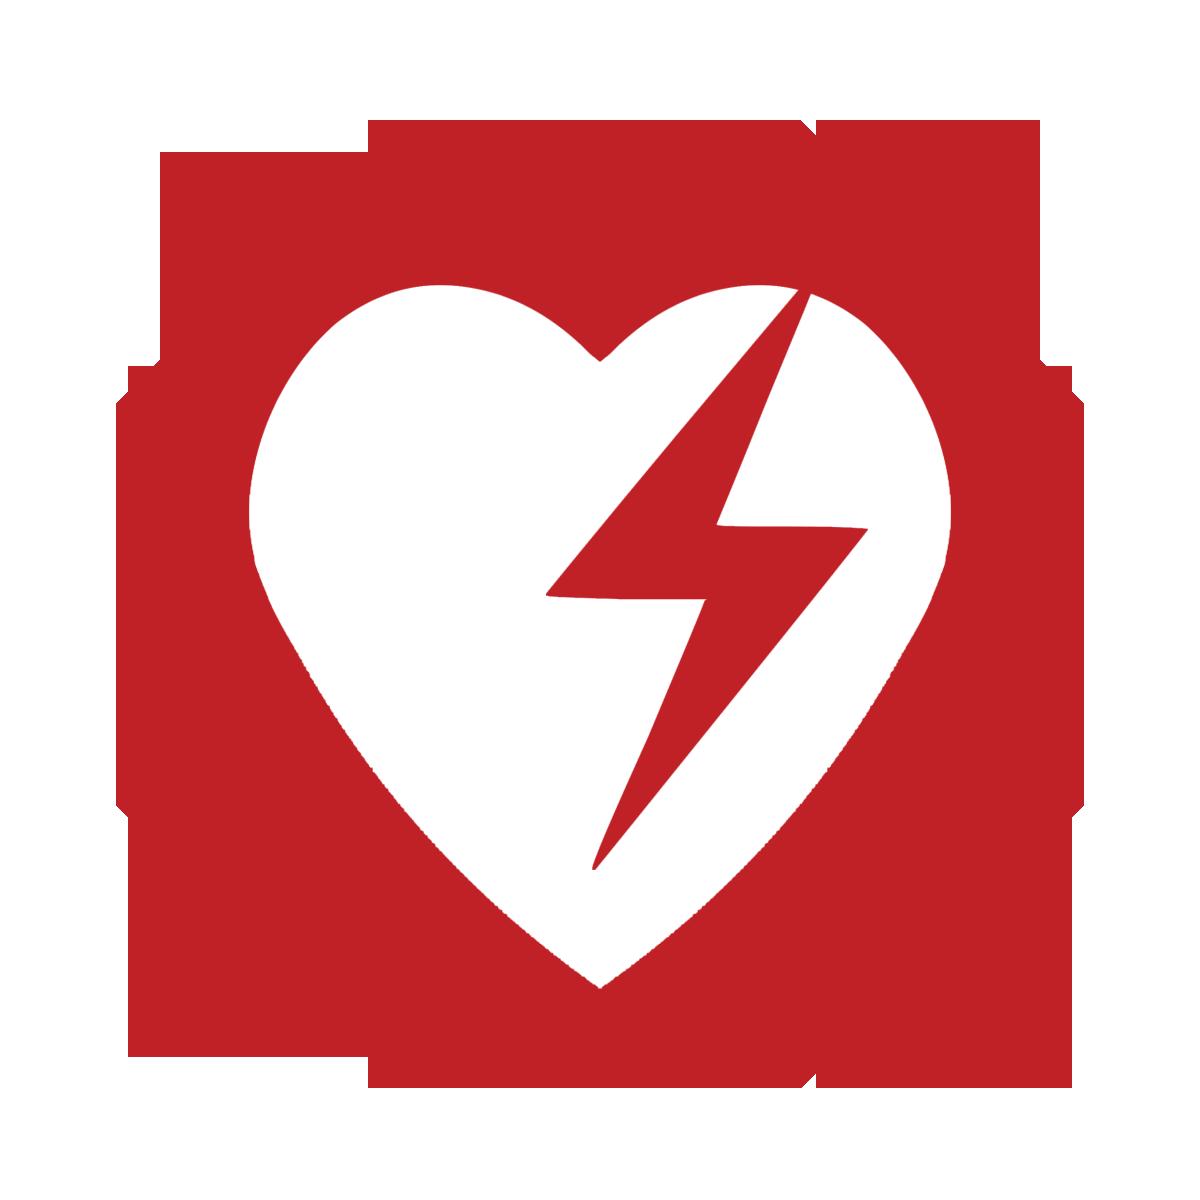 Stop Heart Attack Logo